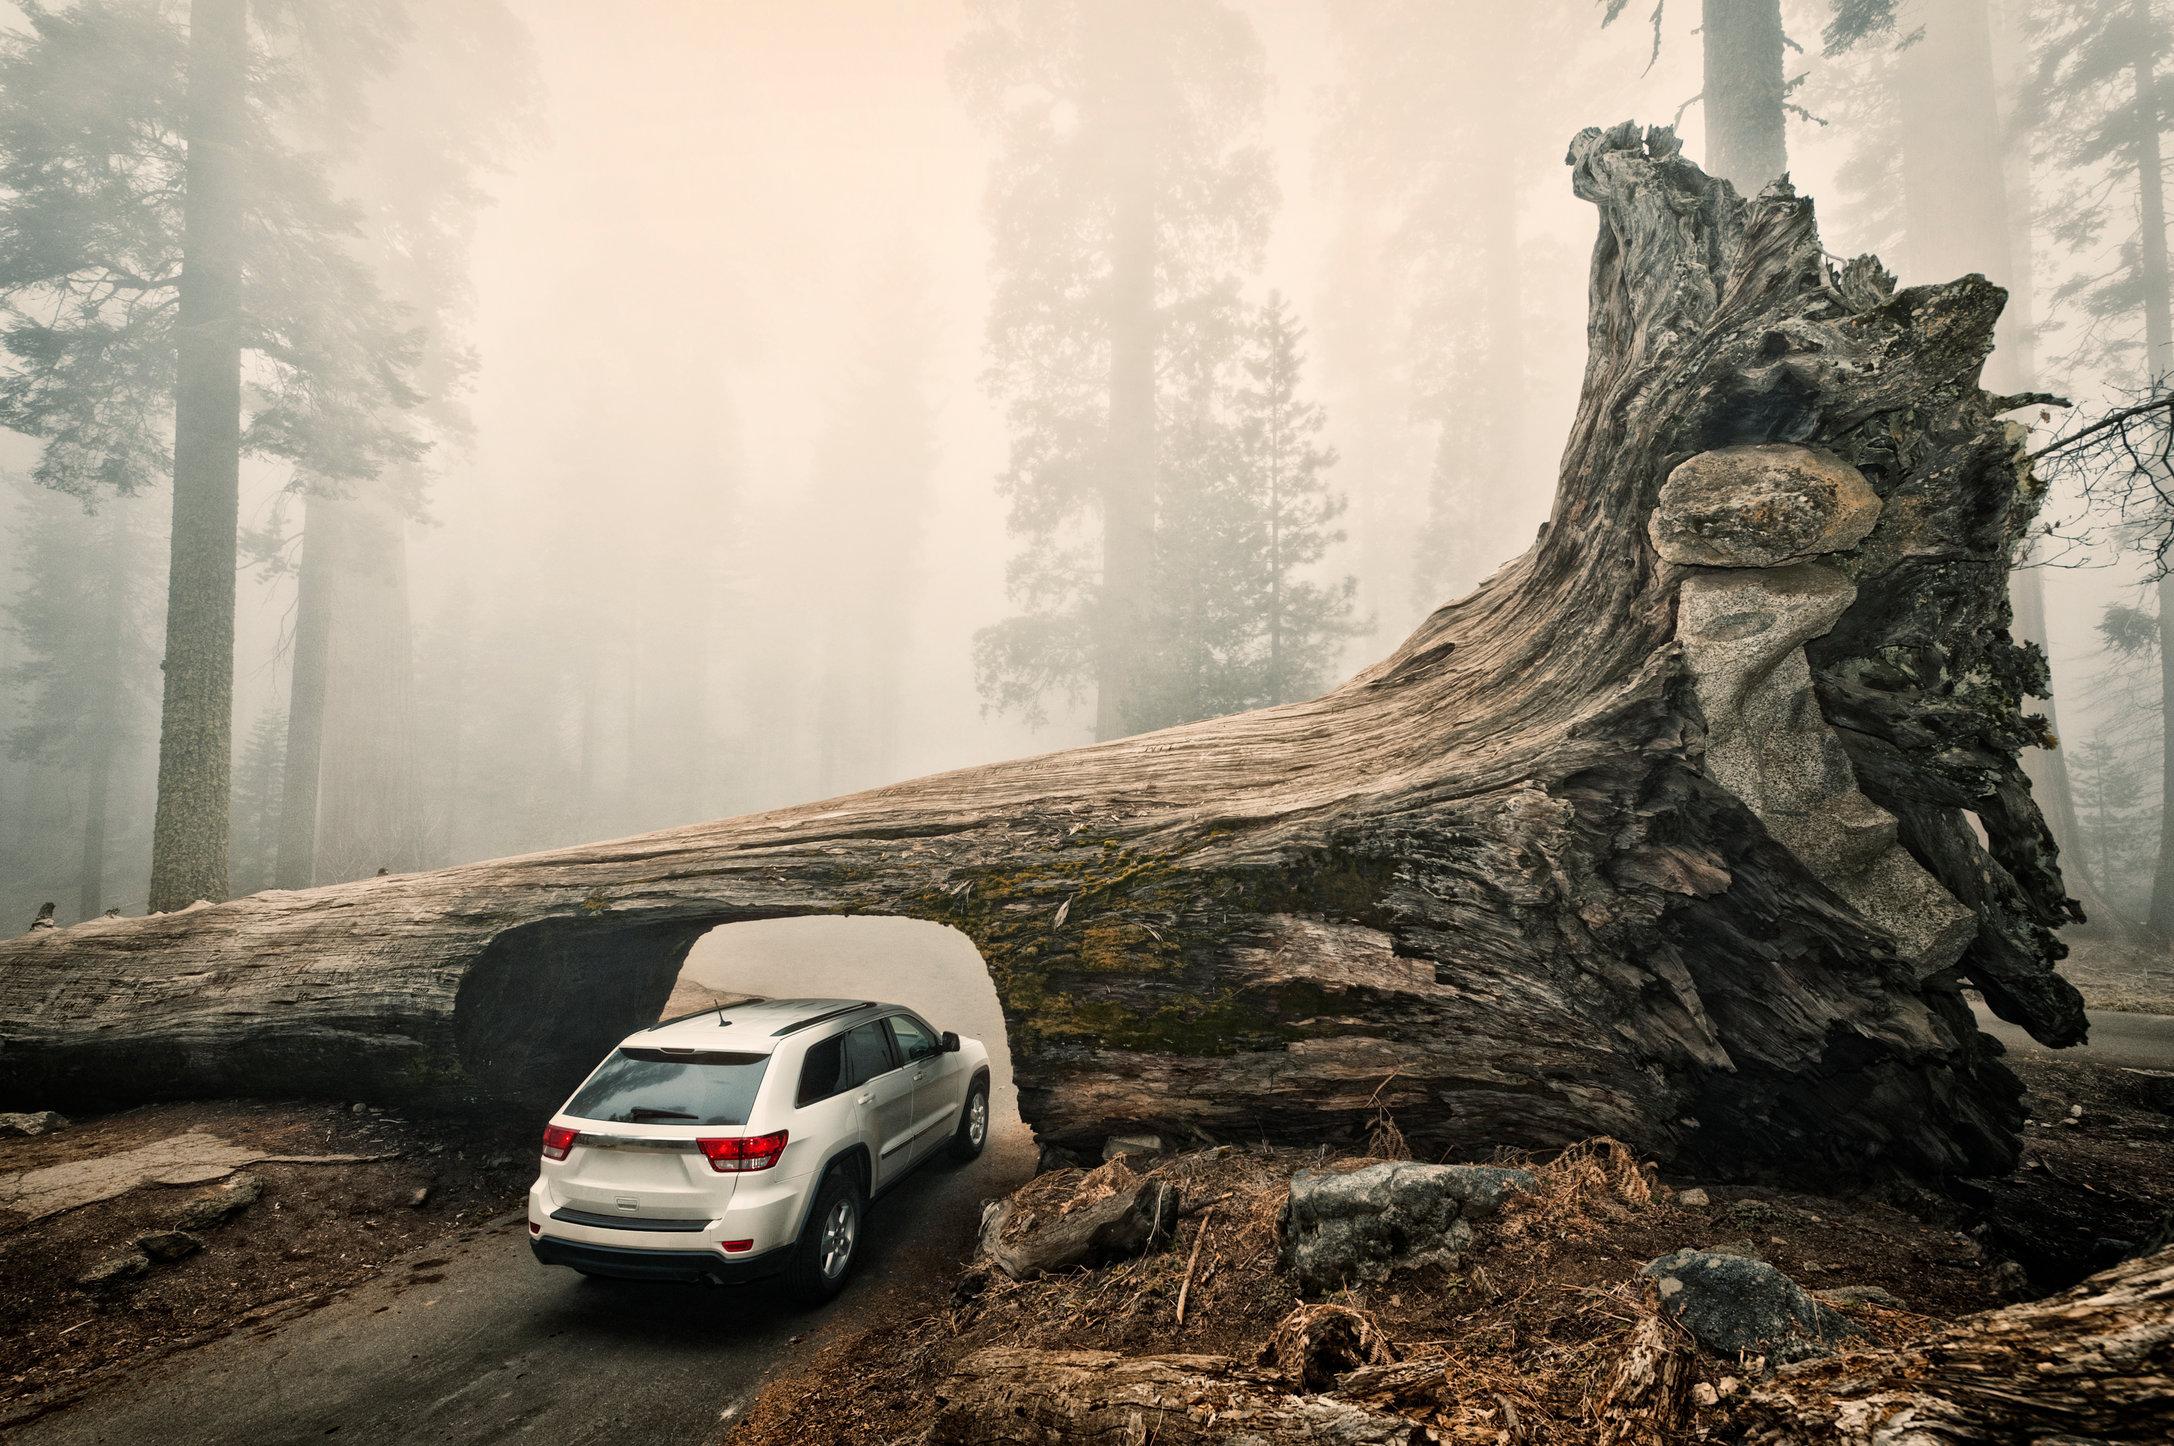 Sequoia Down No Tags Hi Res.jpg